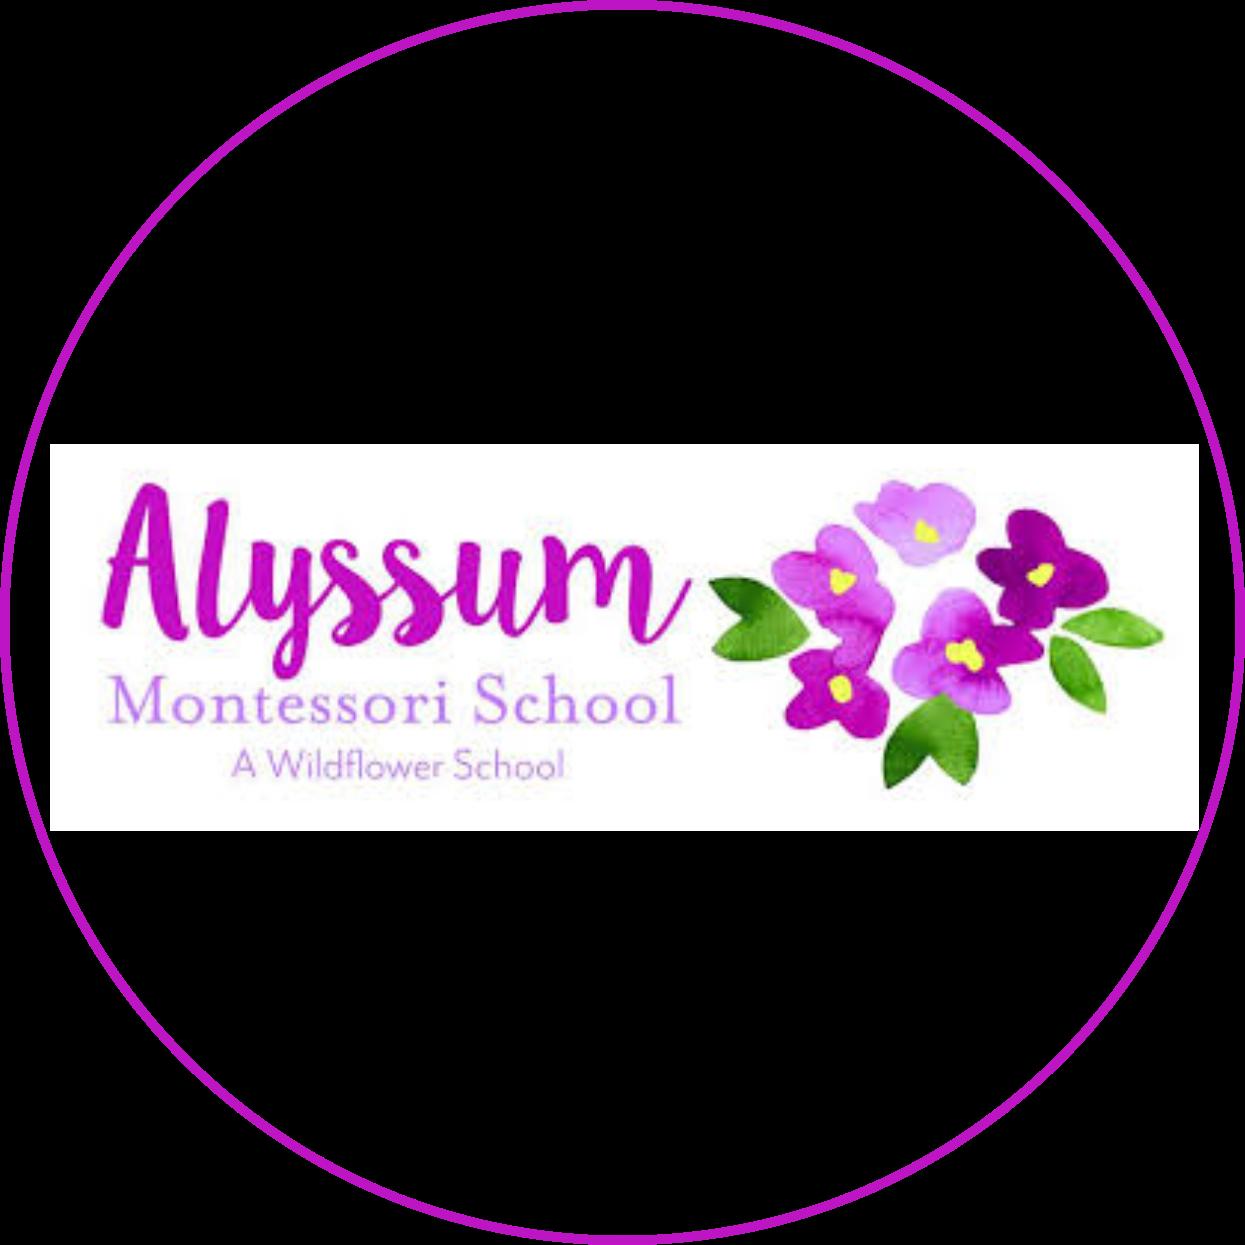 Alyssum Montessori School - Fort Wayne, IndianaInvited Project Partner